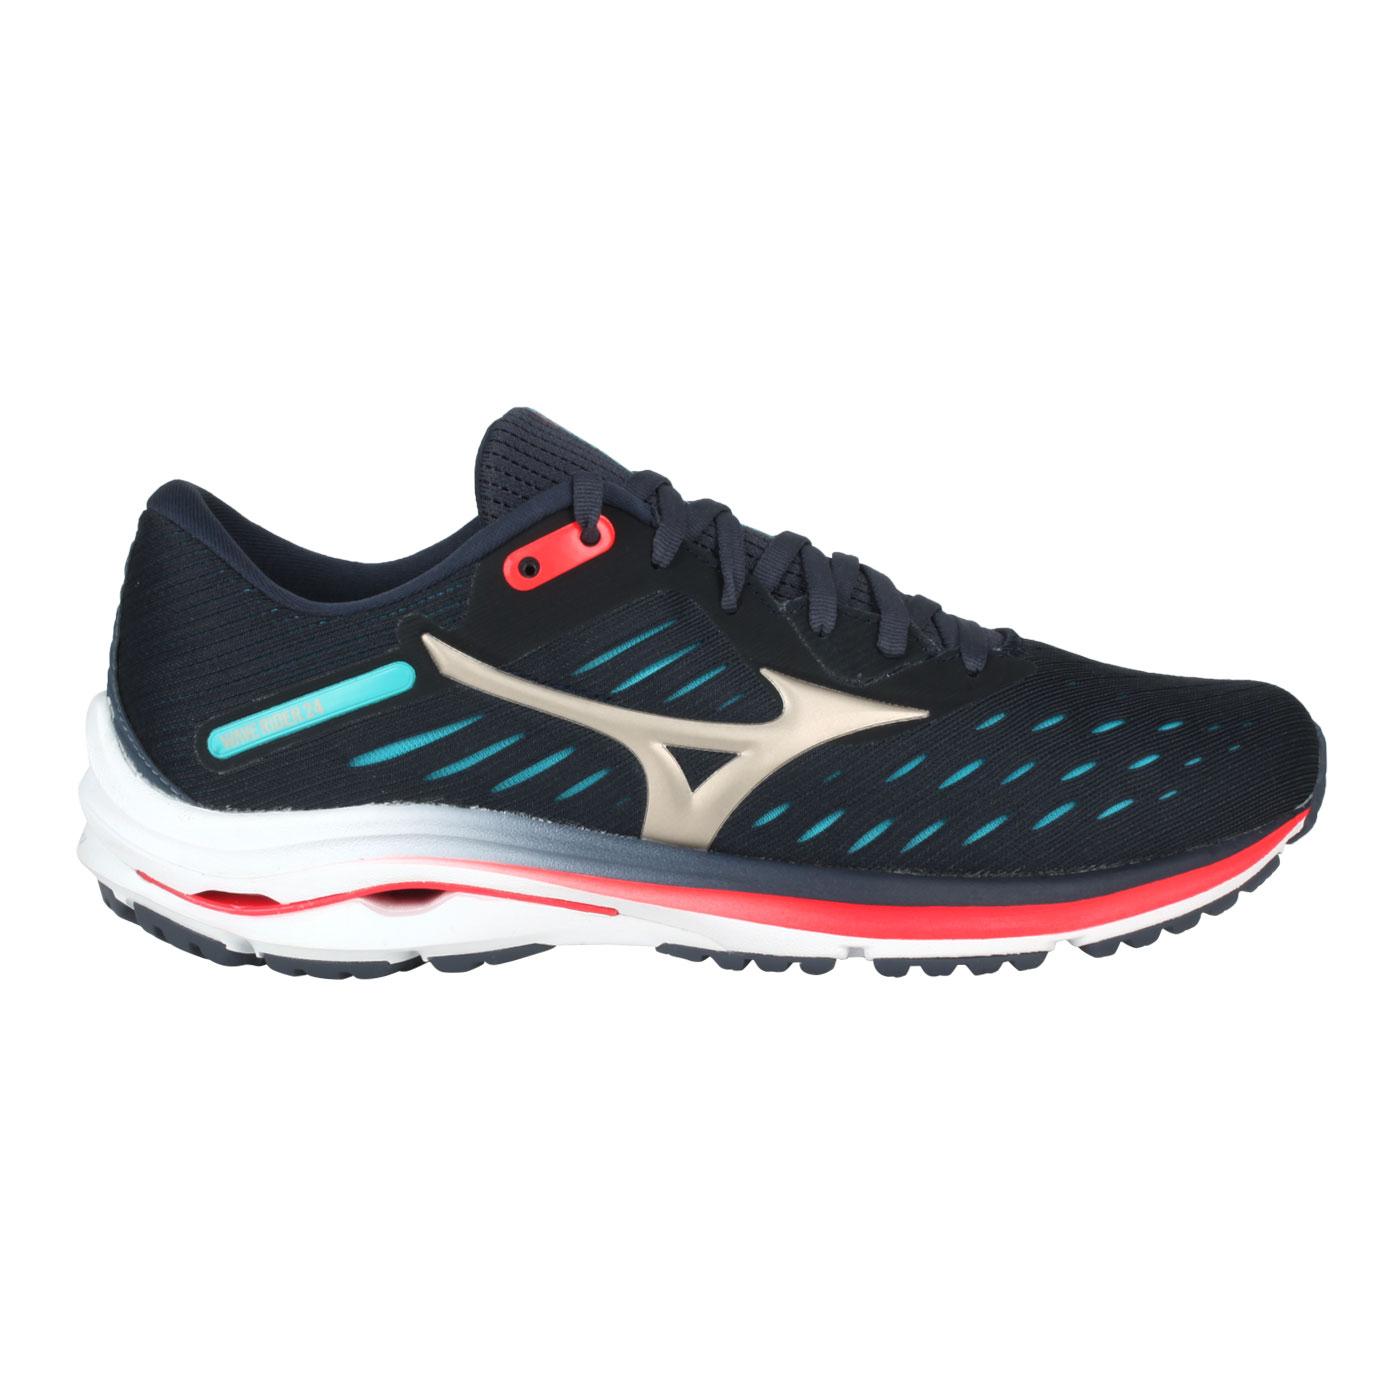 MIZUNO 男慢跑鞋  @WAVE RIDER 24@J1GC200342 - 藍香檳金